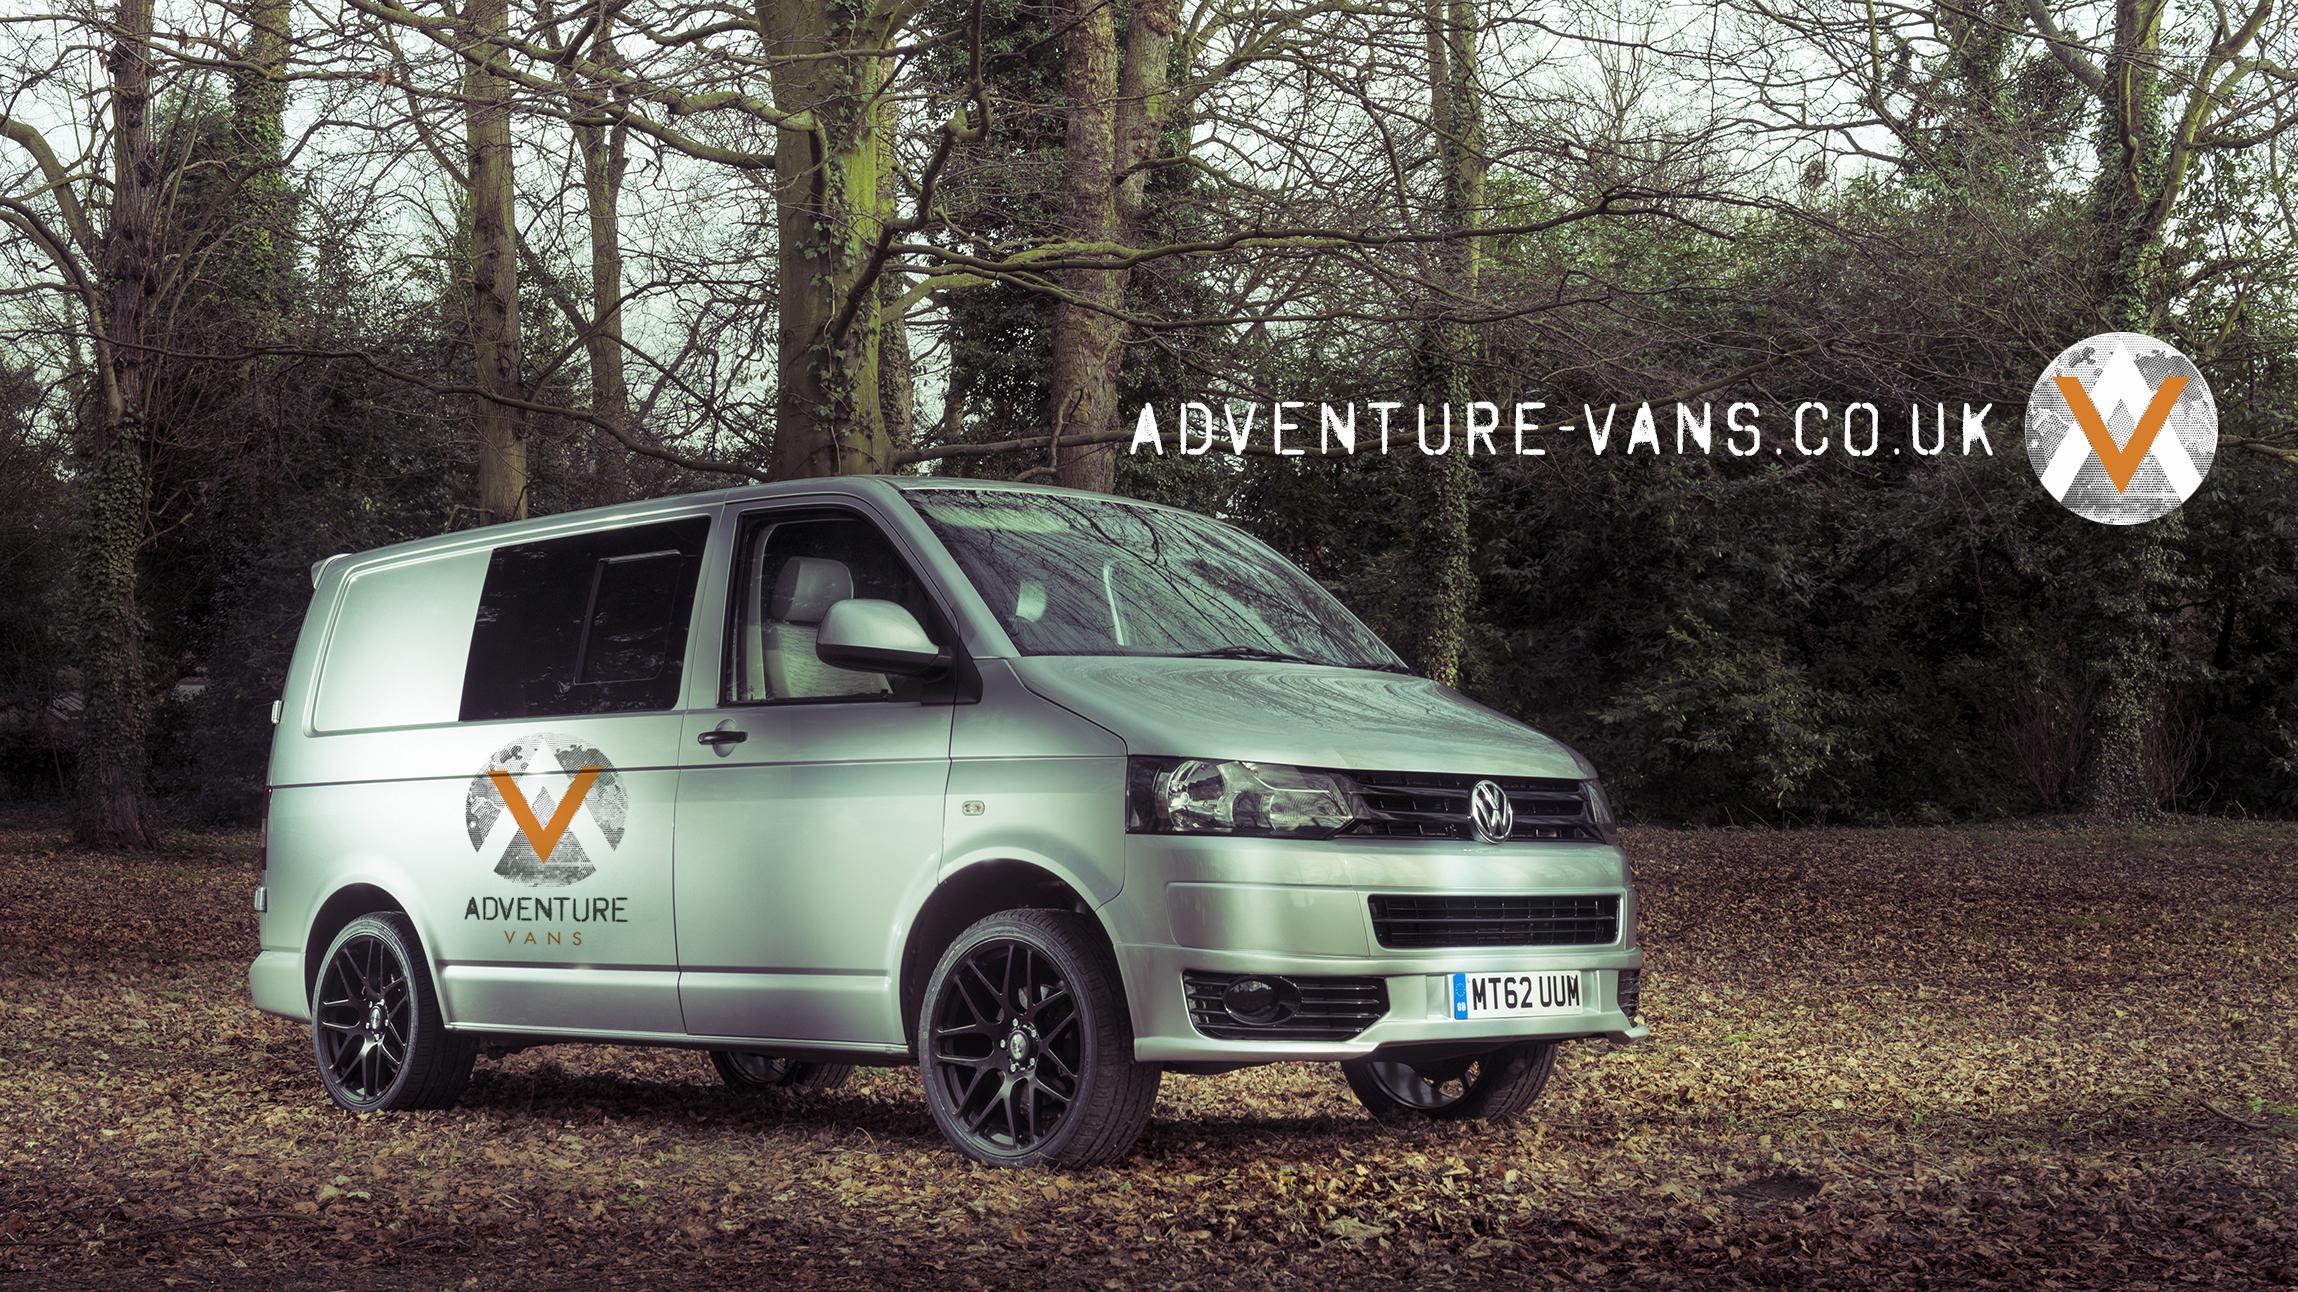 2017-2 AdventureVans van1- main image with logo.jpg